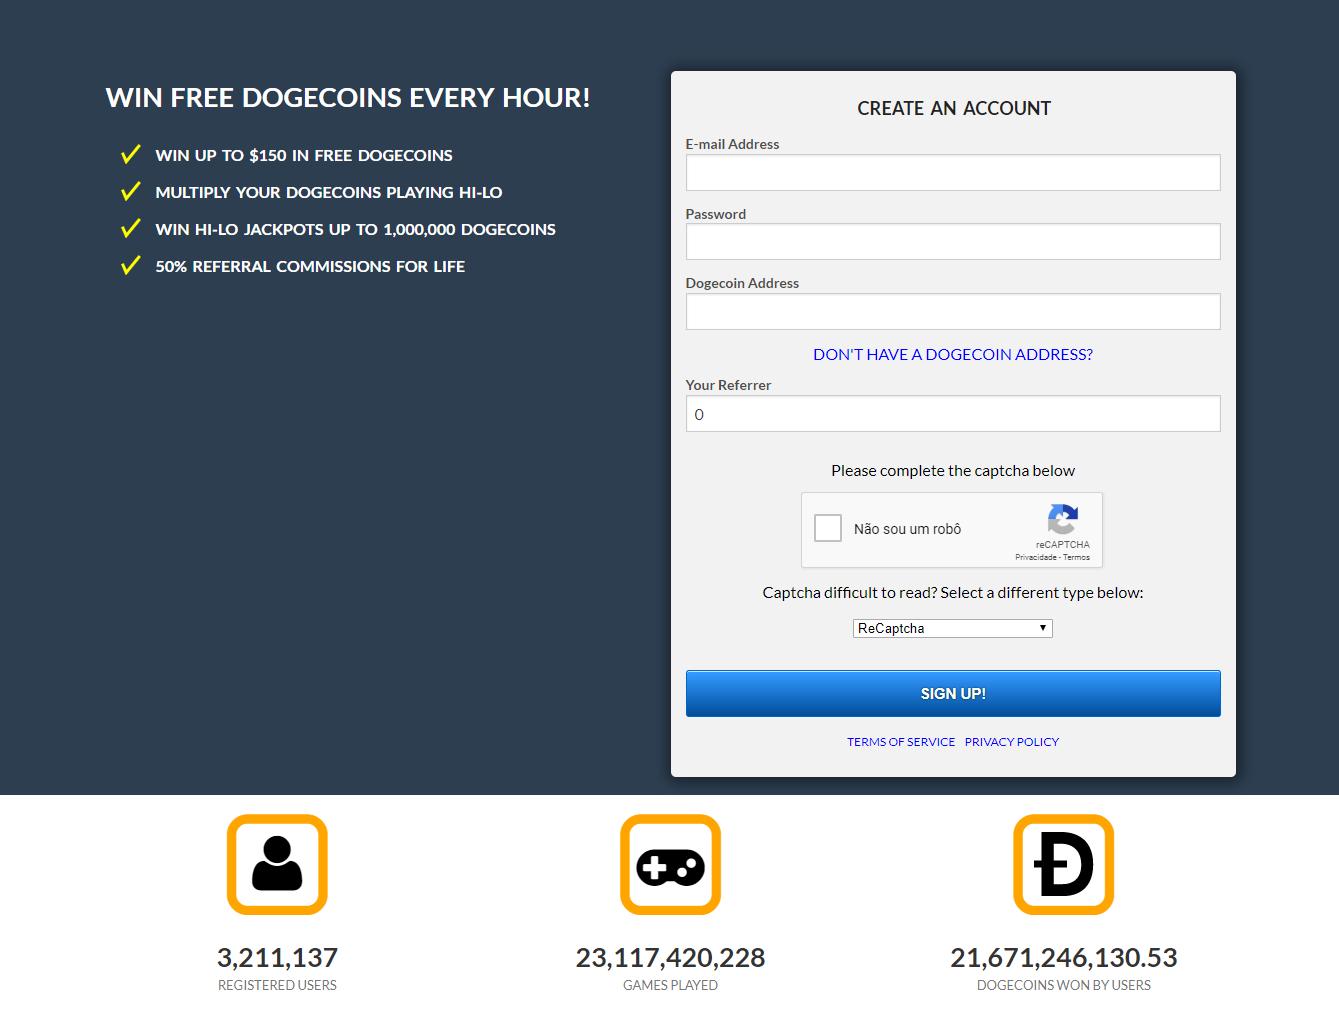 FireShot Capture 252 FreeDoge.co .in Win free dogecoins every hour https   freedoge.co .in  - Ganhe Dólares por hora com Dodge Coin